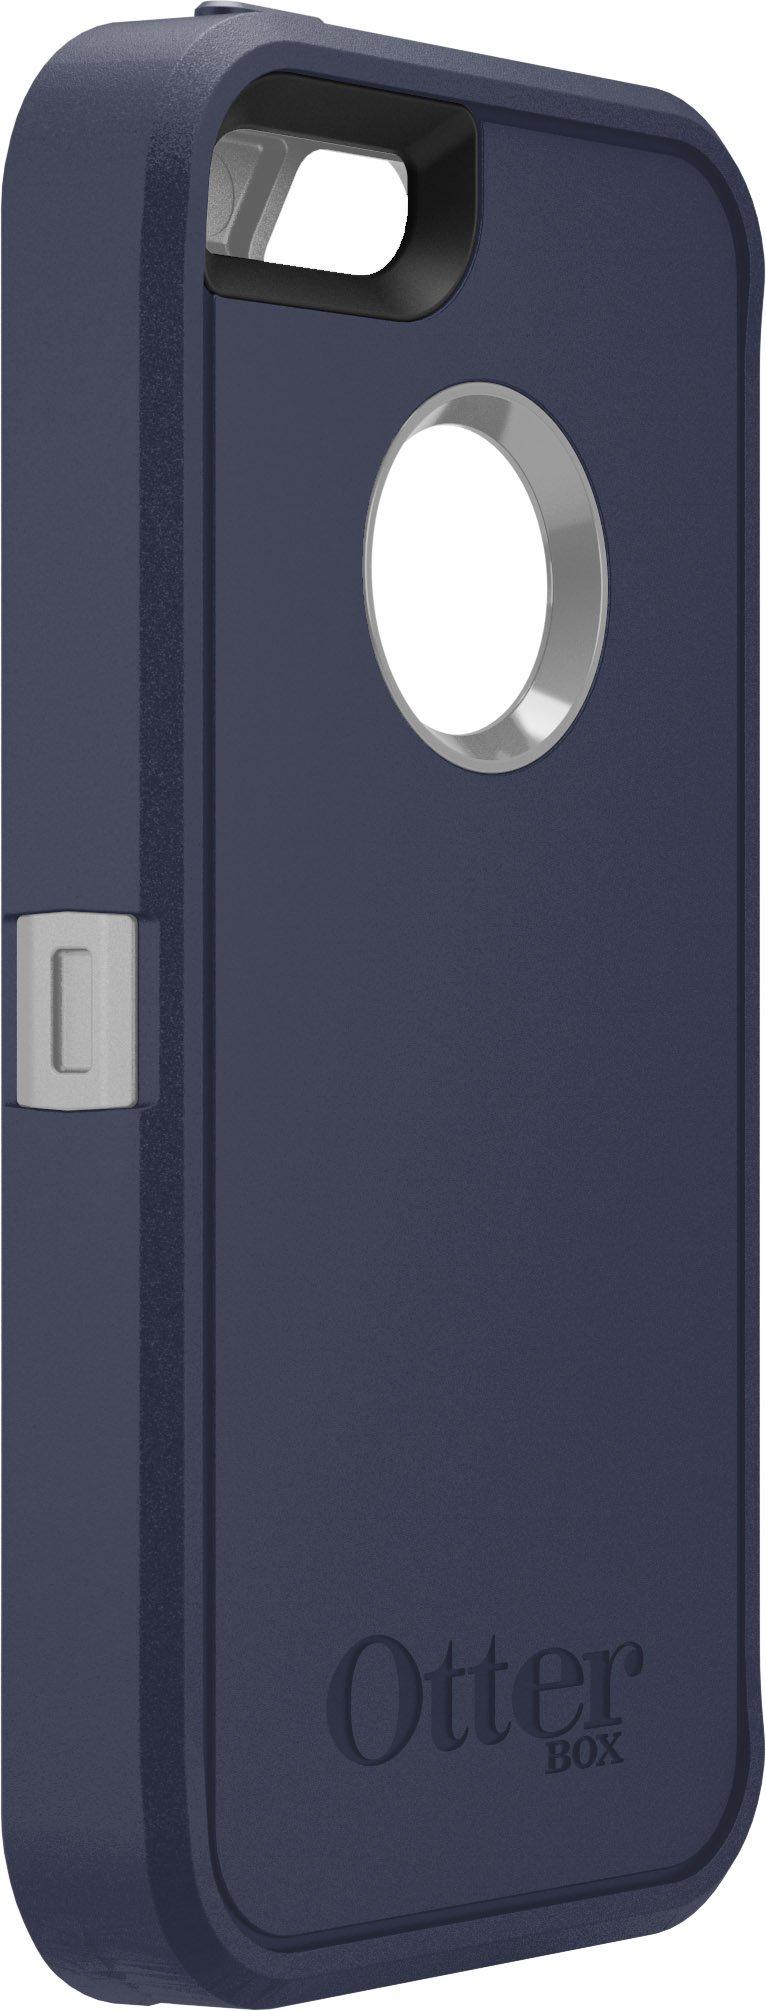 OtterBox DEFENDER SERIES Case for iPhone 5/5s/SE - Retail Packaging - MARINE (GUNMETAL GREY/ADMIRAL BLUE)